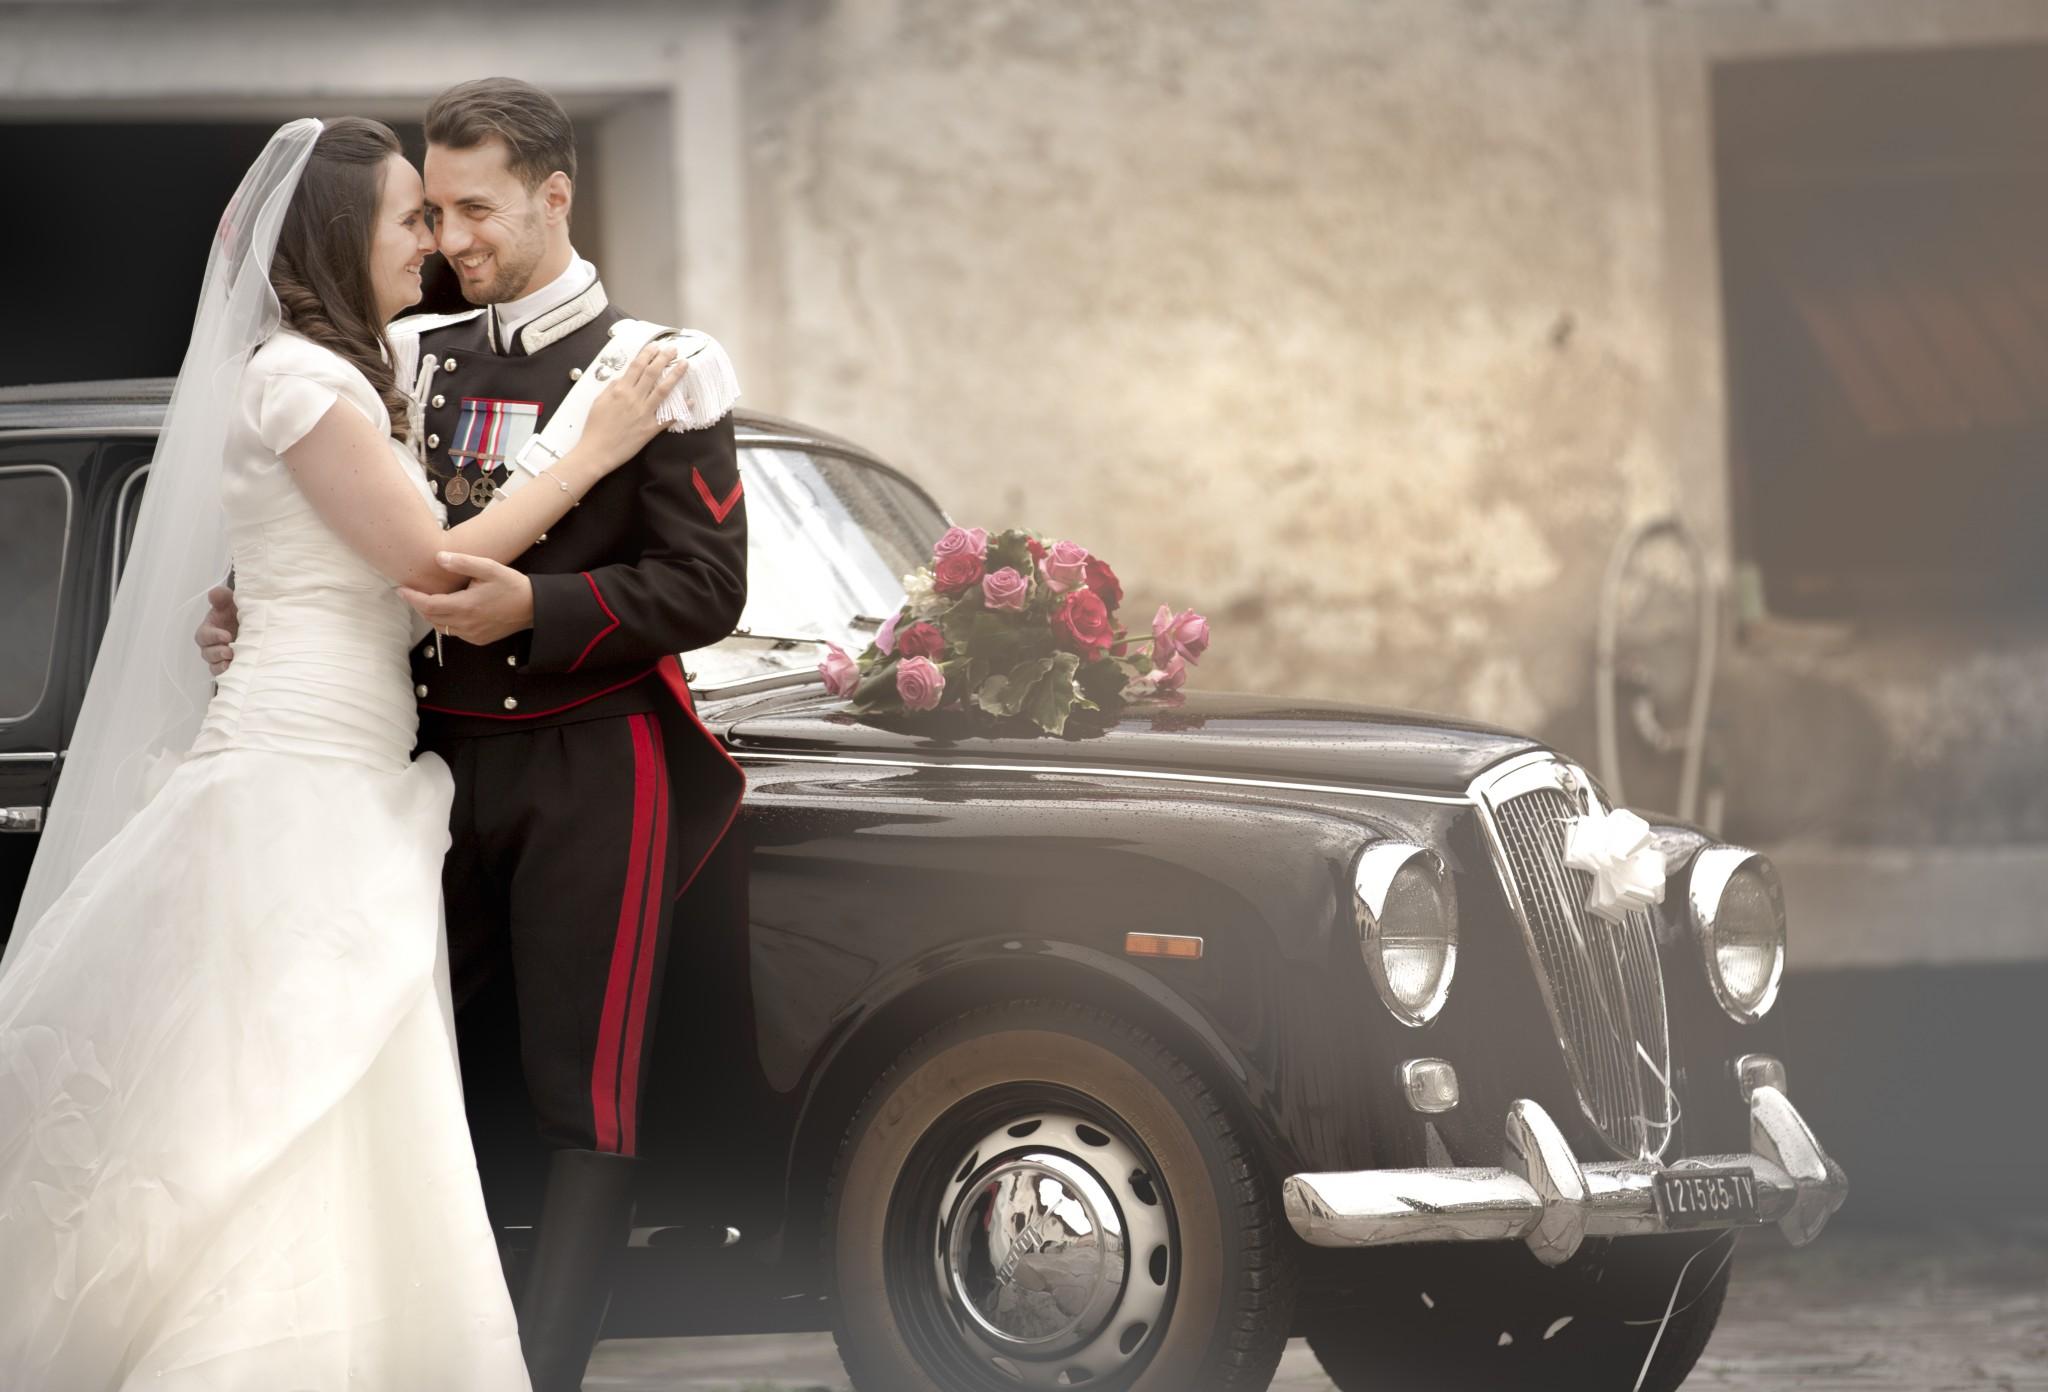 matrimonio carabiniere